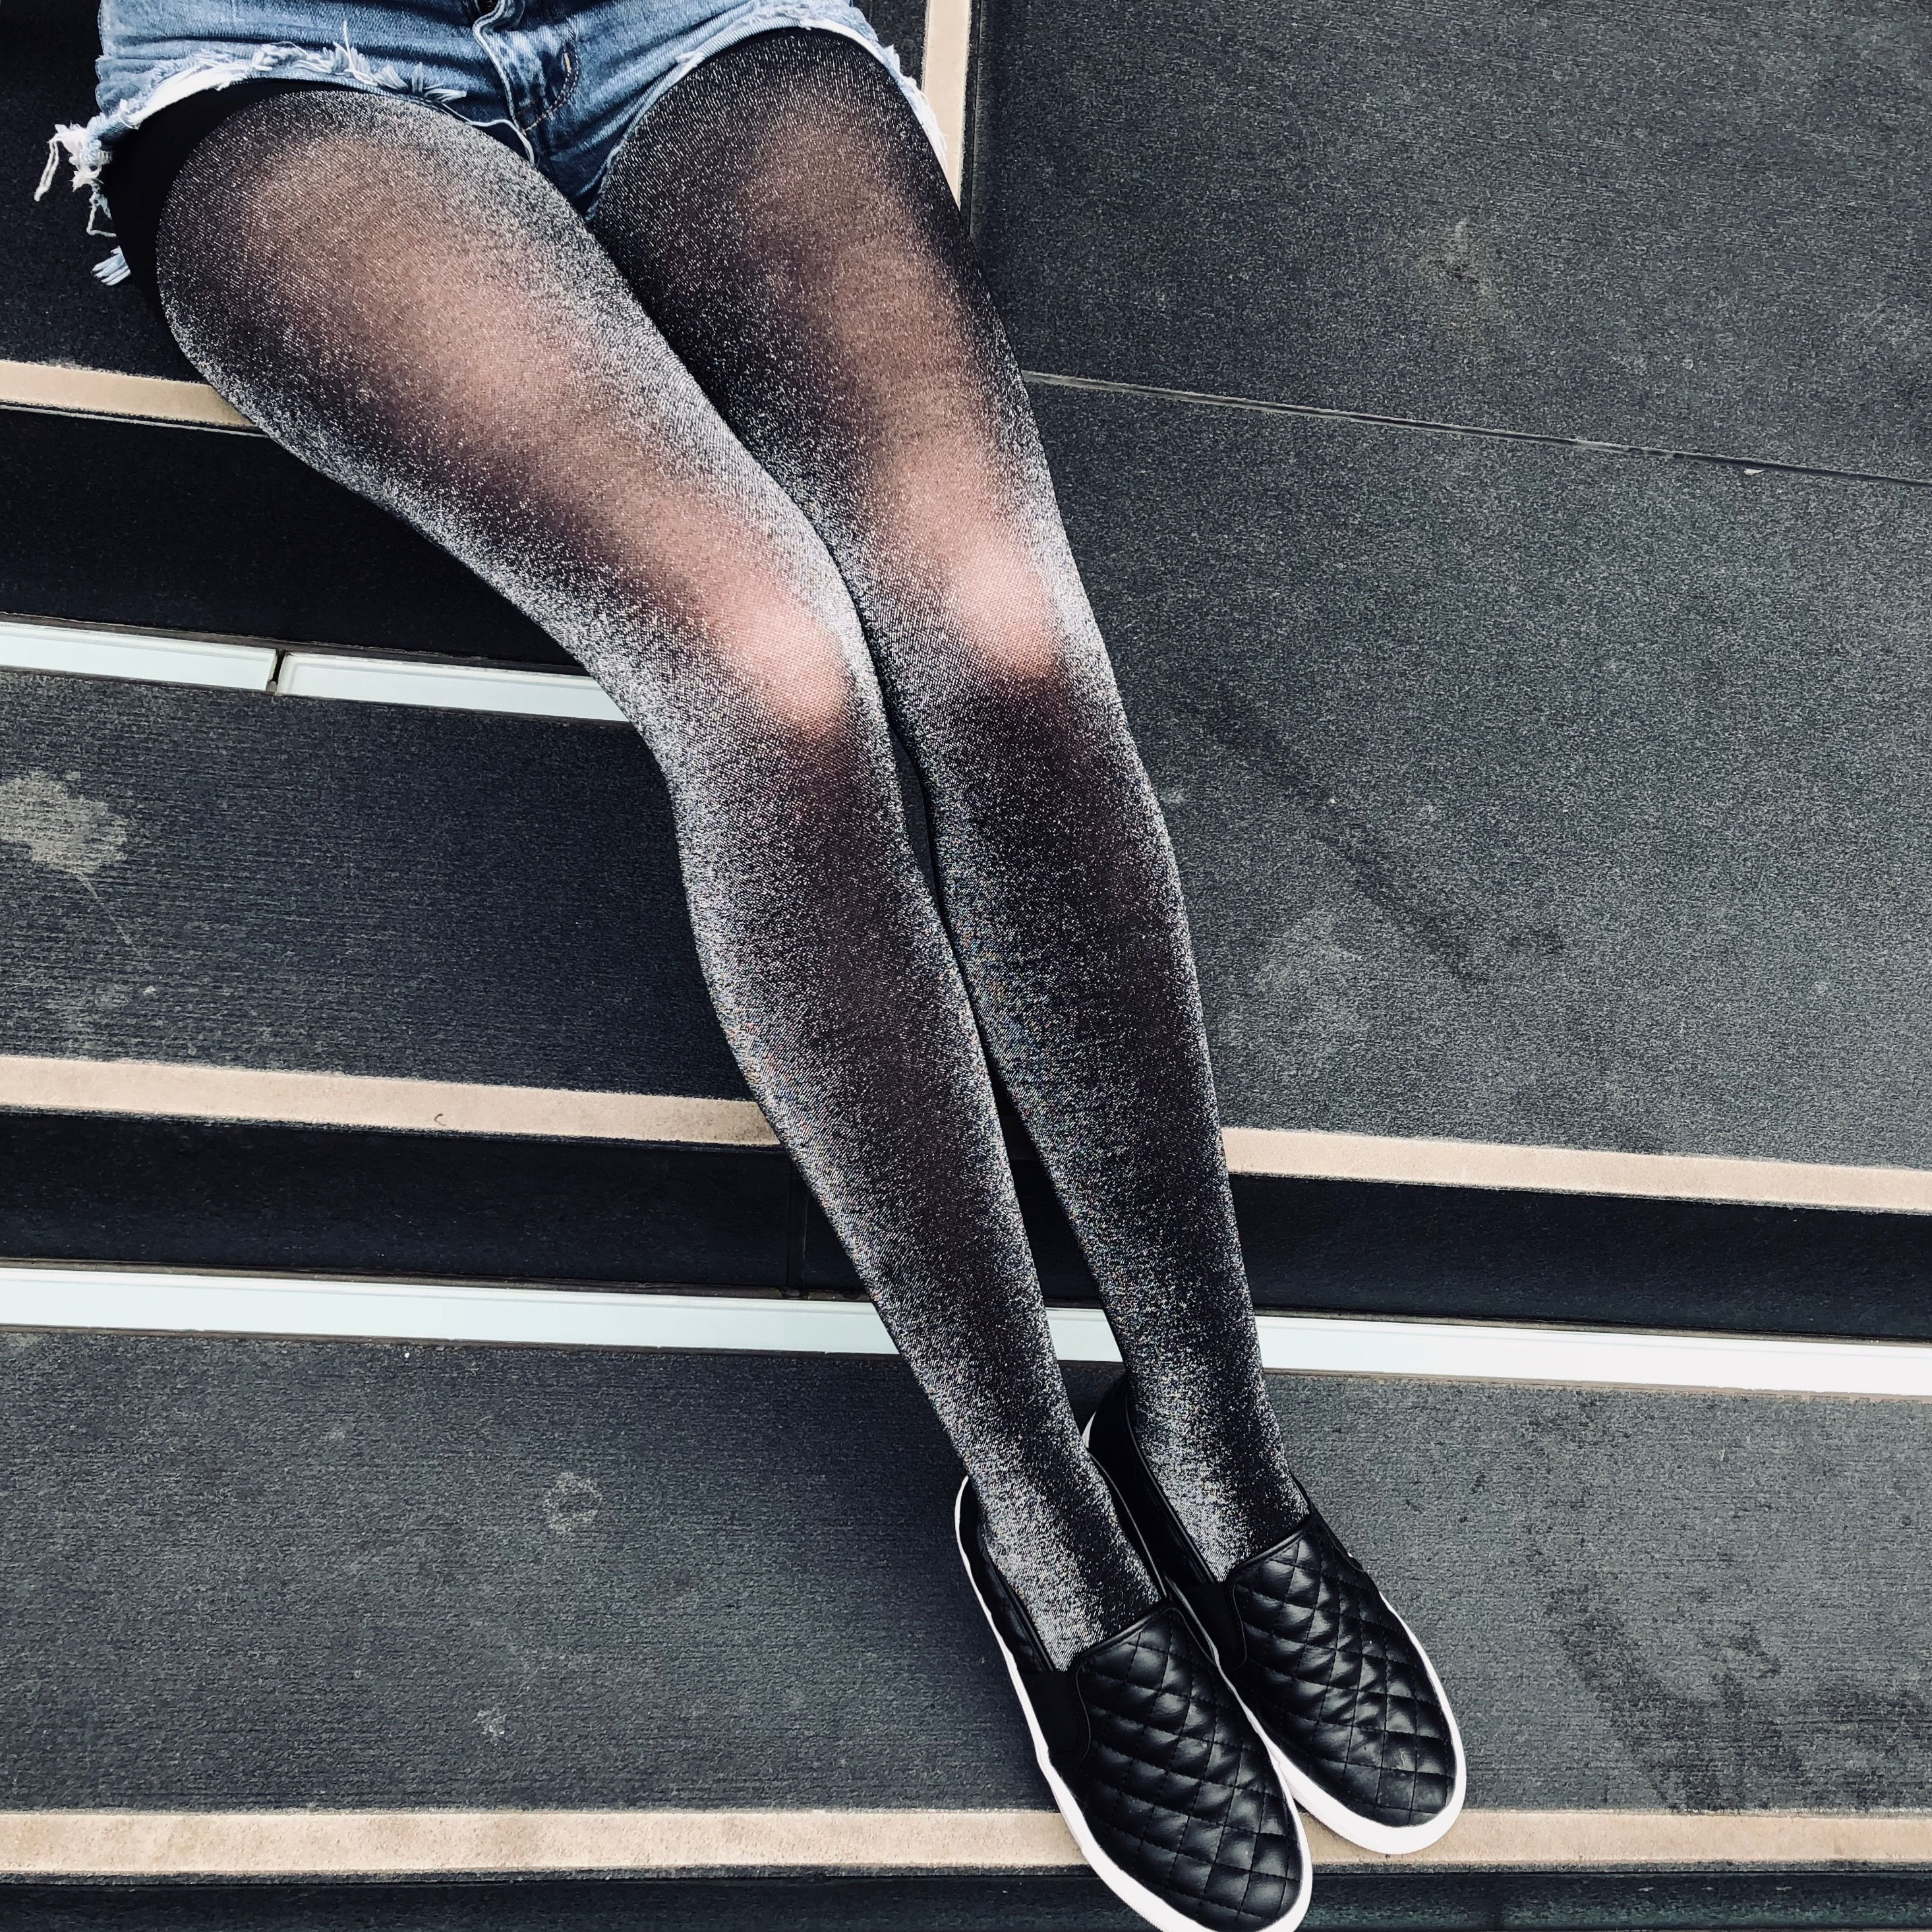 c24e917ca MEMOI GLITTER TIGHTS  Opaque tights with glitter. 40 denier   Control top.  Available in black gold